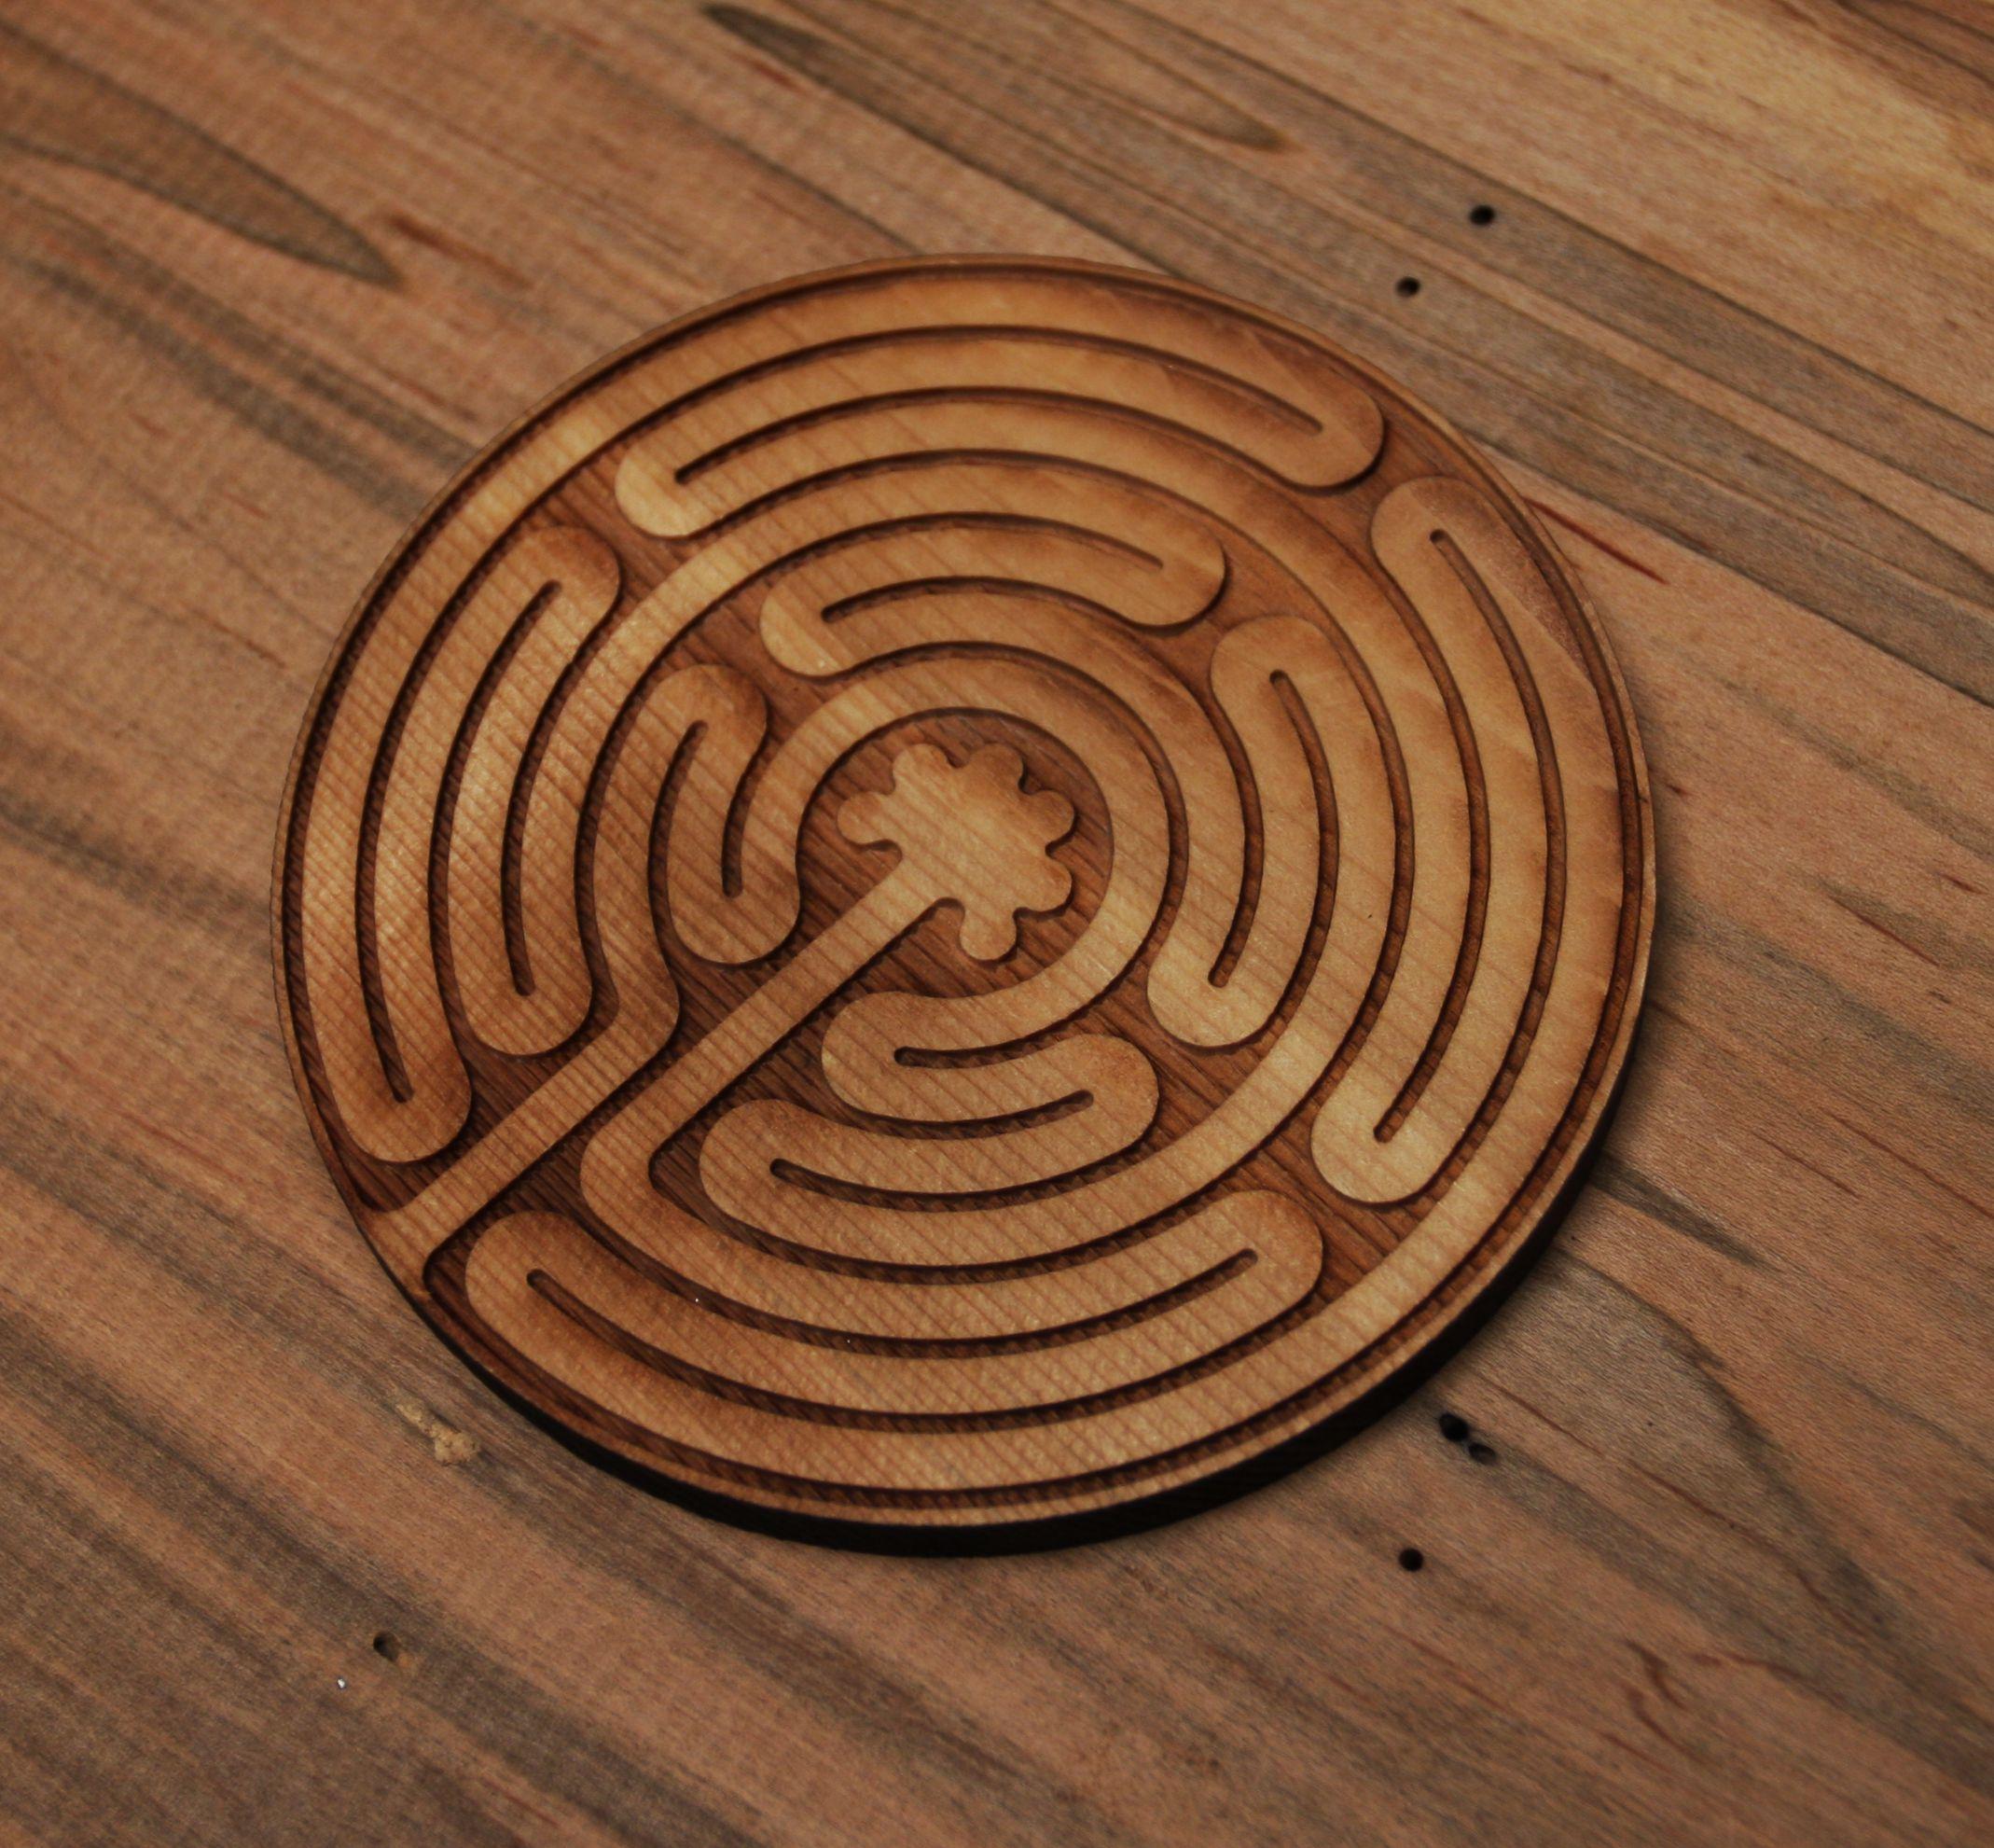 Labyrinth coaster